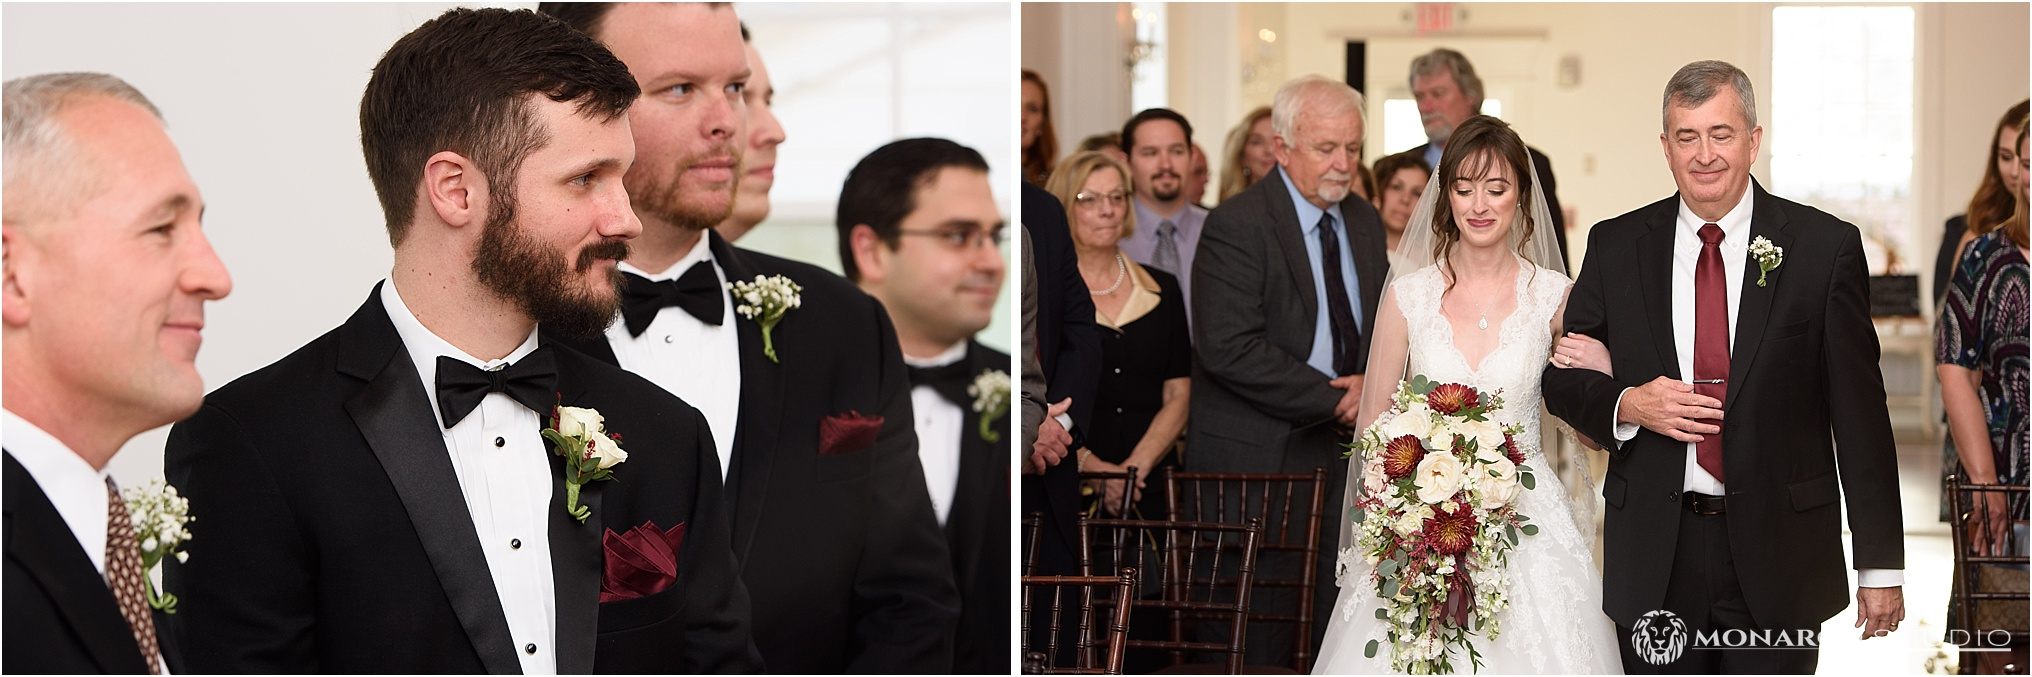 st-augustine-wedding-photographer-white-room-051.jpg